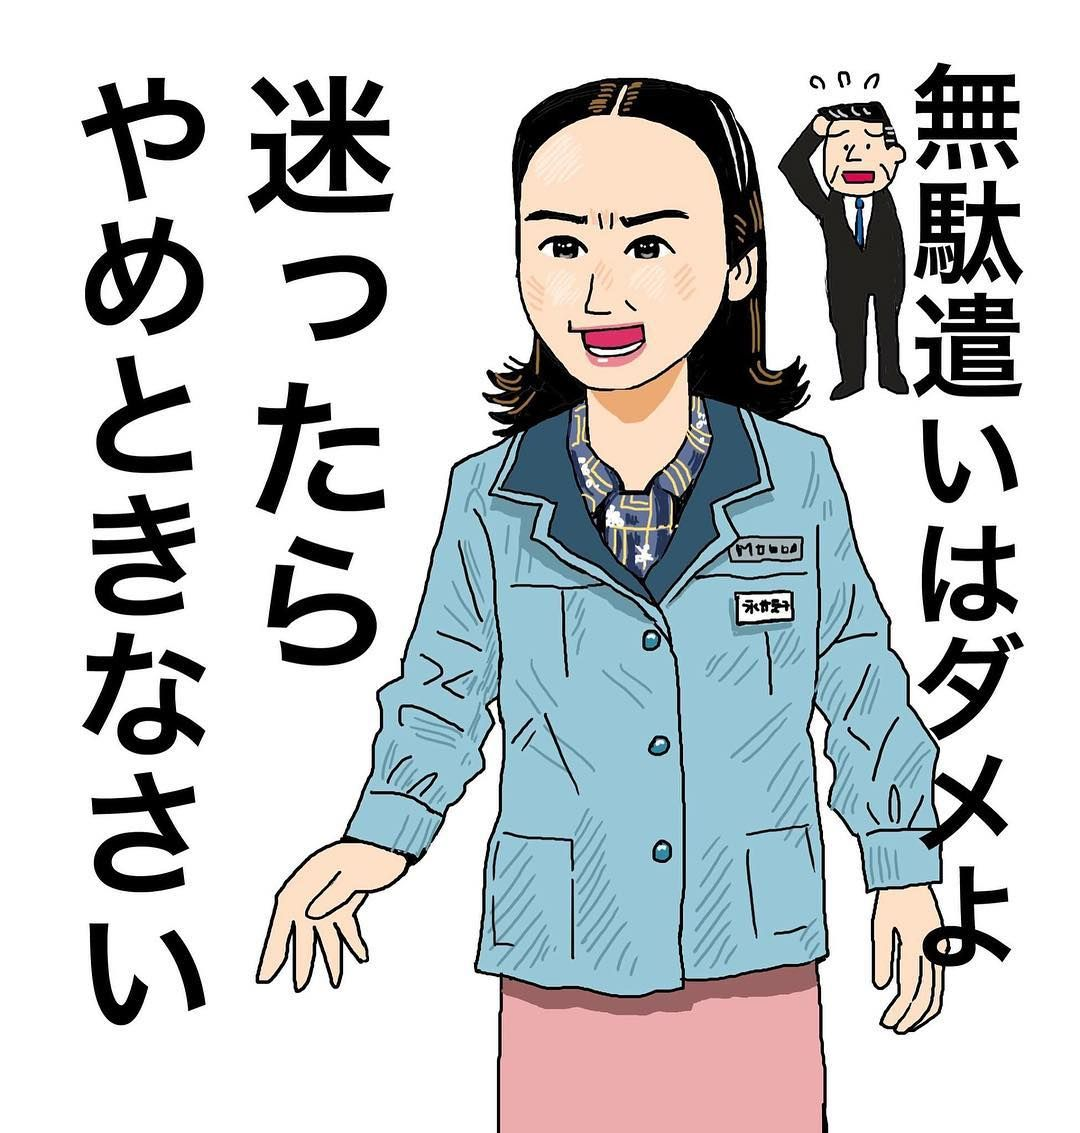 3d hentai love whisout limits ひよっこ #軽い営業妨害 #nhk #連続テレビ小説 #朝ドラ #永井